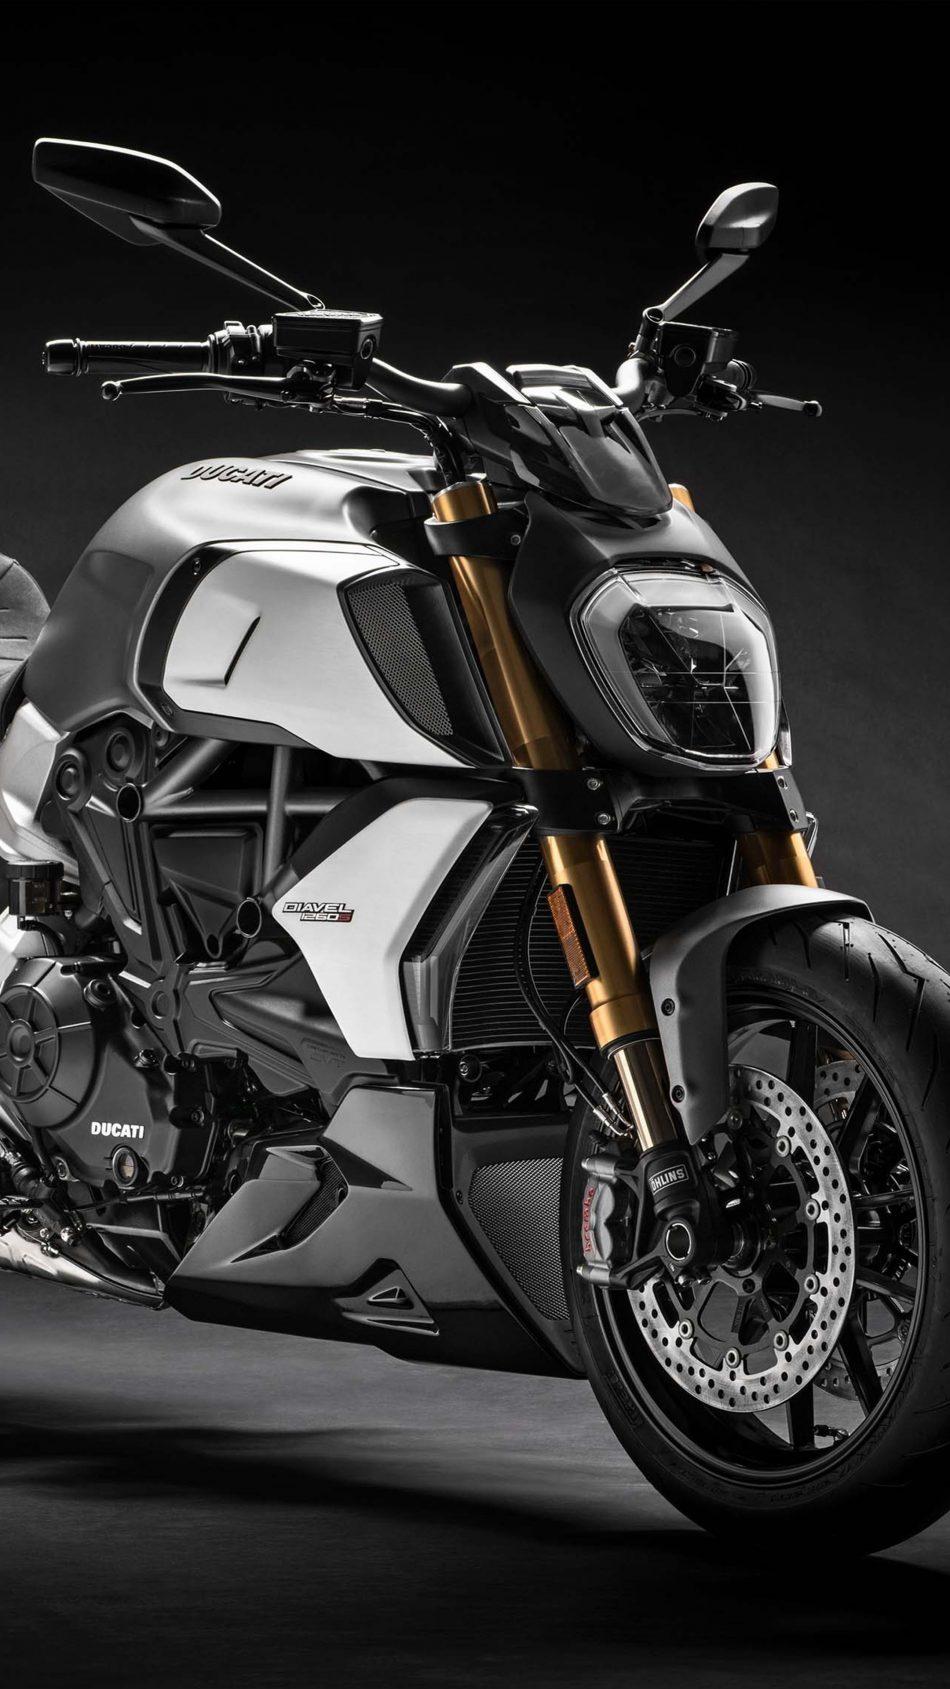 Ducati Diavel 1260 S 4K Ultra HD Mobile Wallpaper